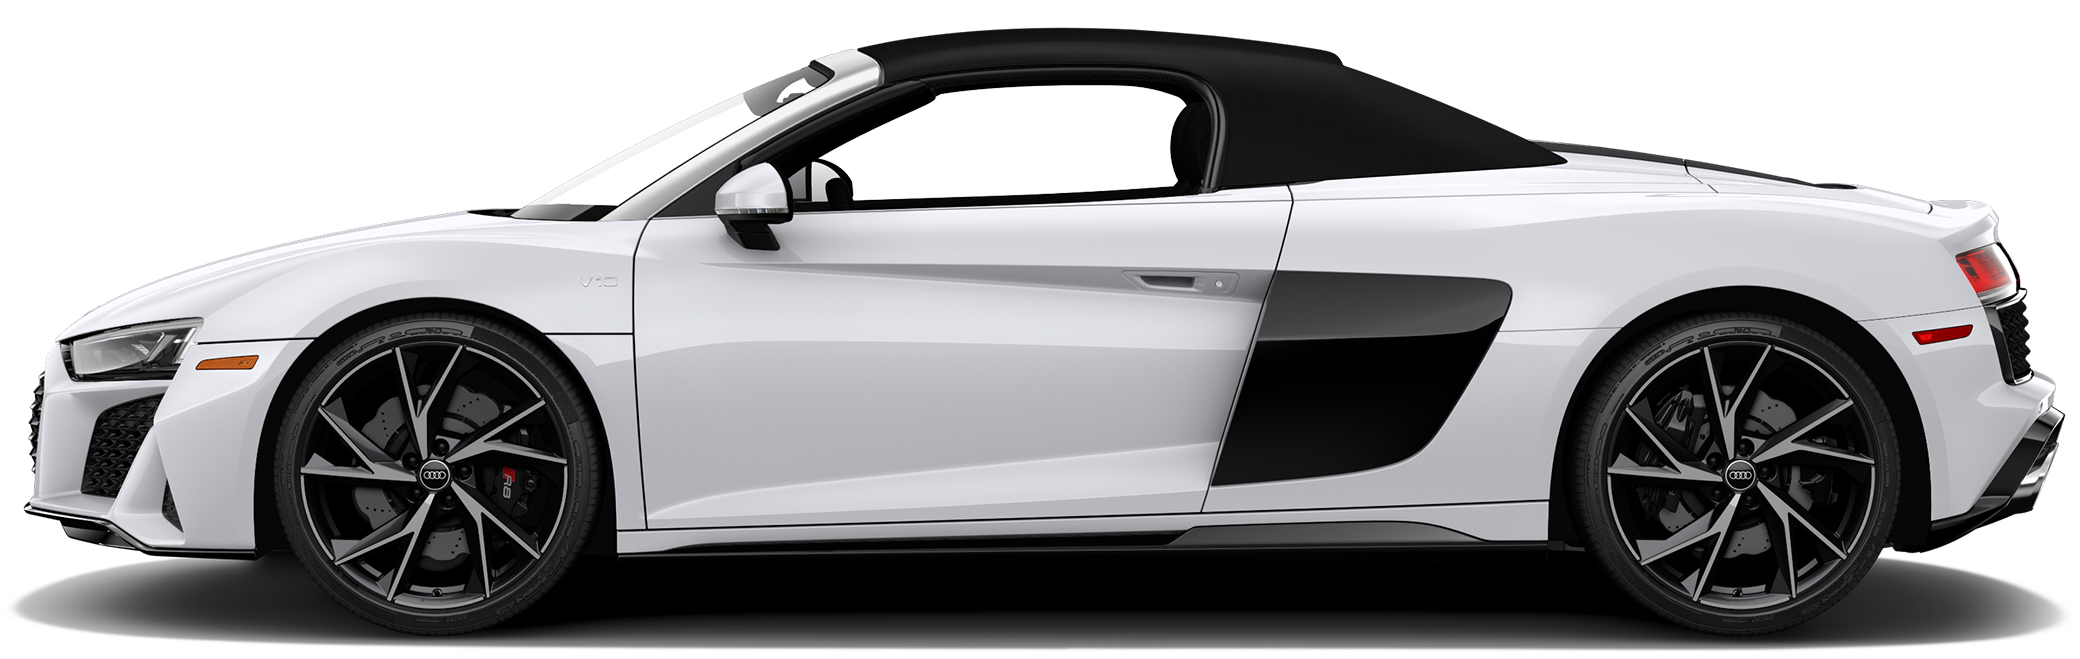 2021 Audi R8 Spyder 5.2 V10